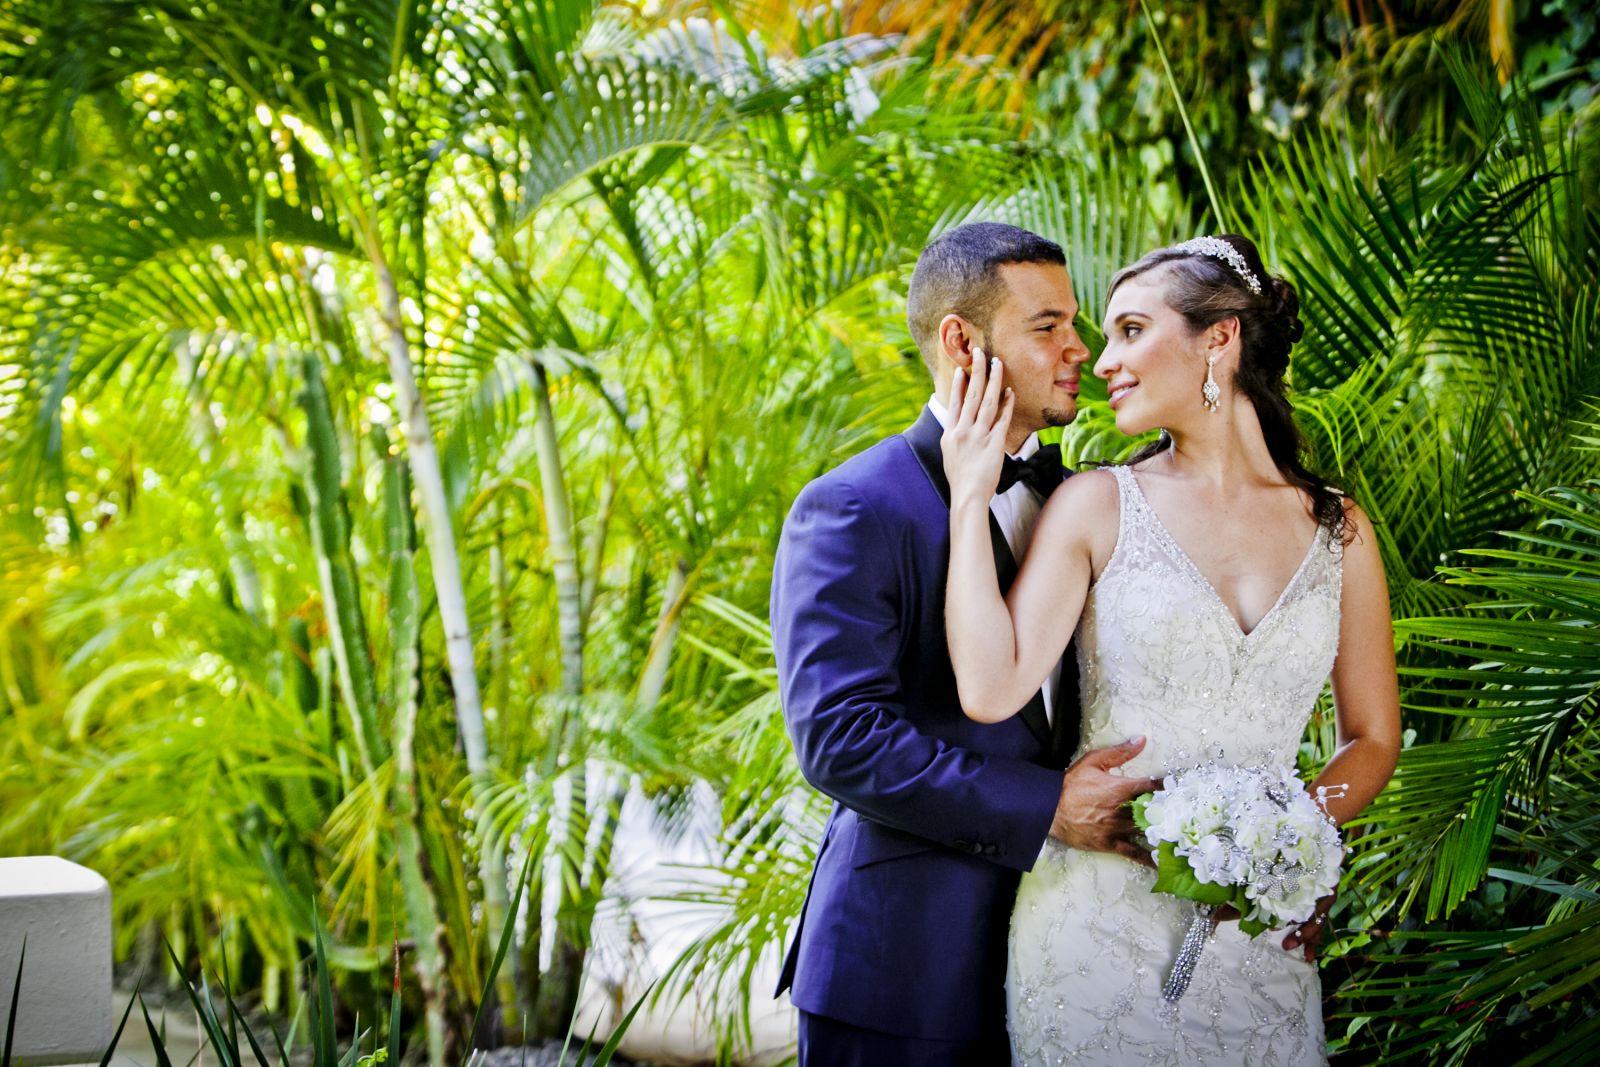 Paradisus Palma Real- 2013 Wedding- Church Ceremony at Jesus Maestro Parish & Beach Reception